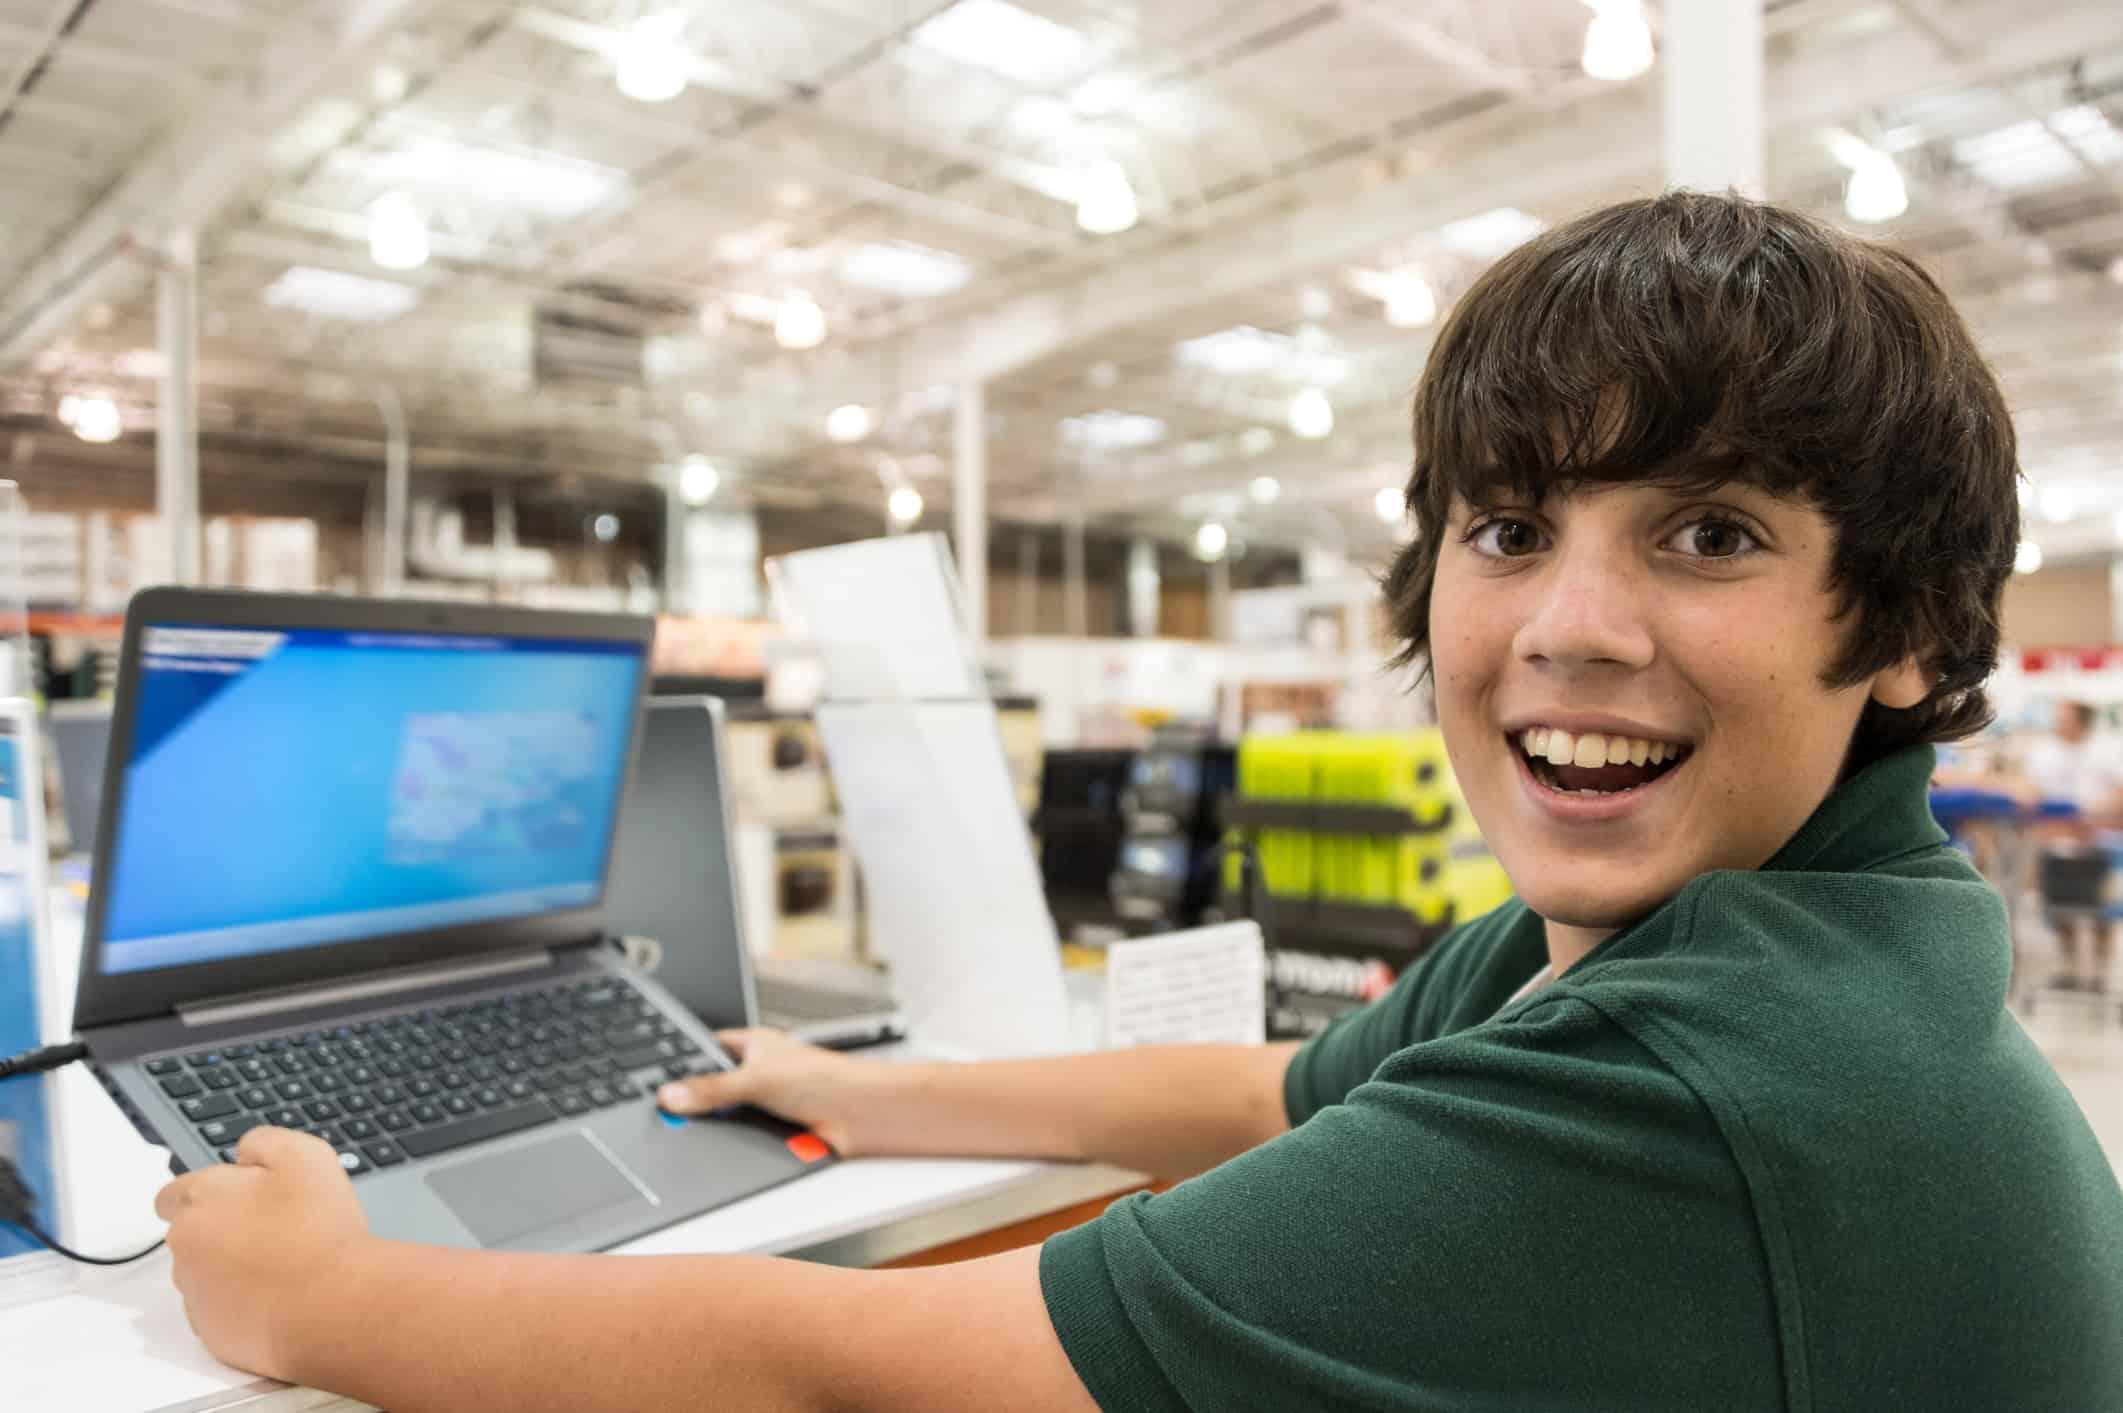 Smiling boy holding new laptop